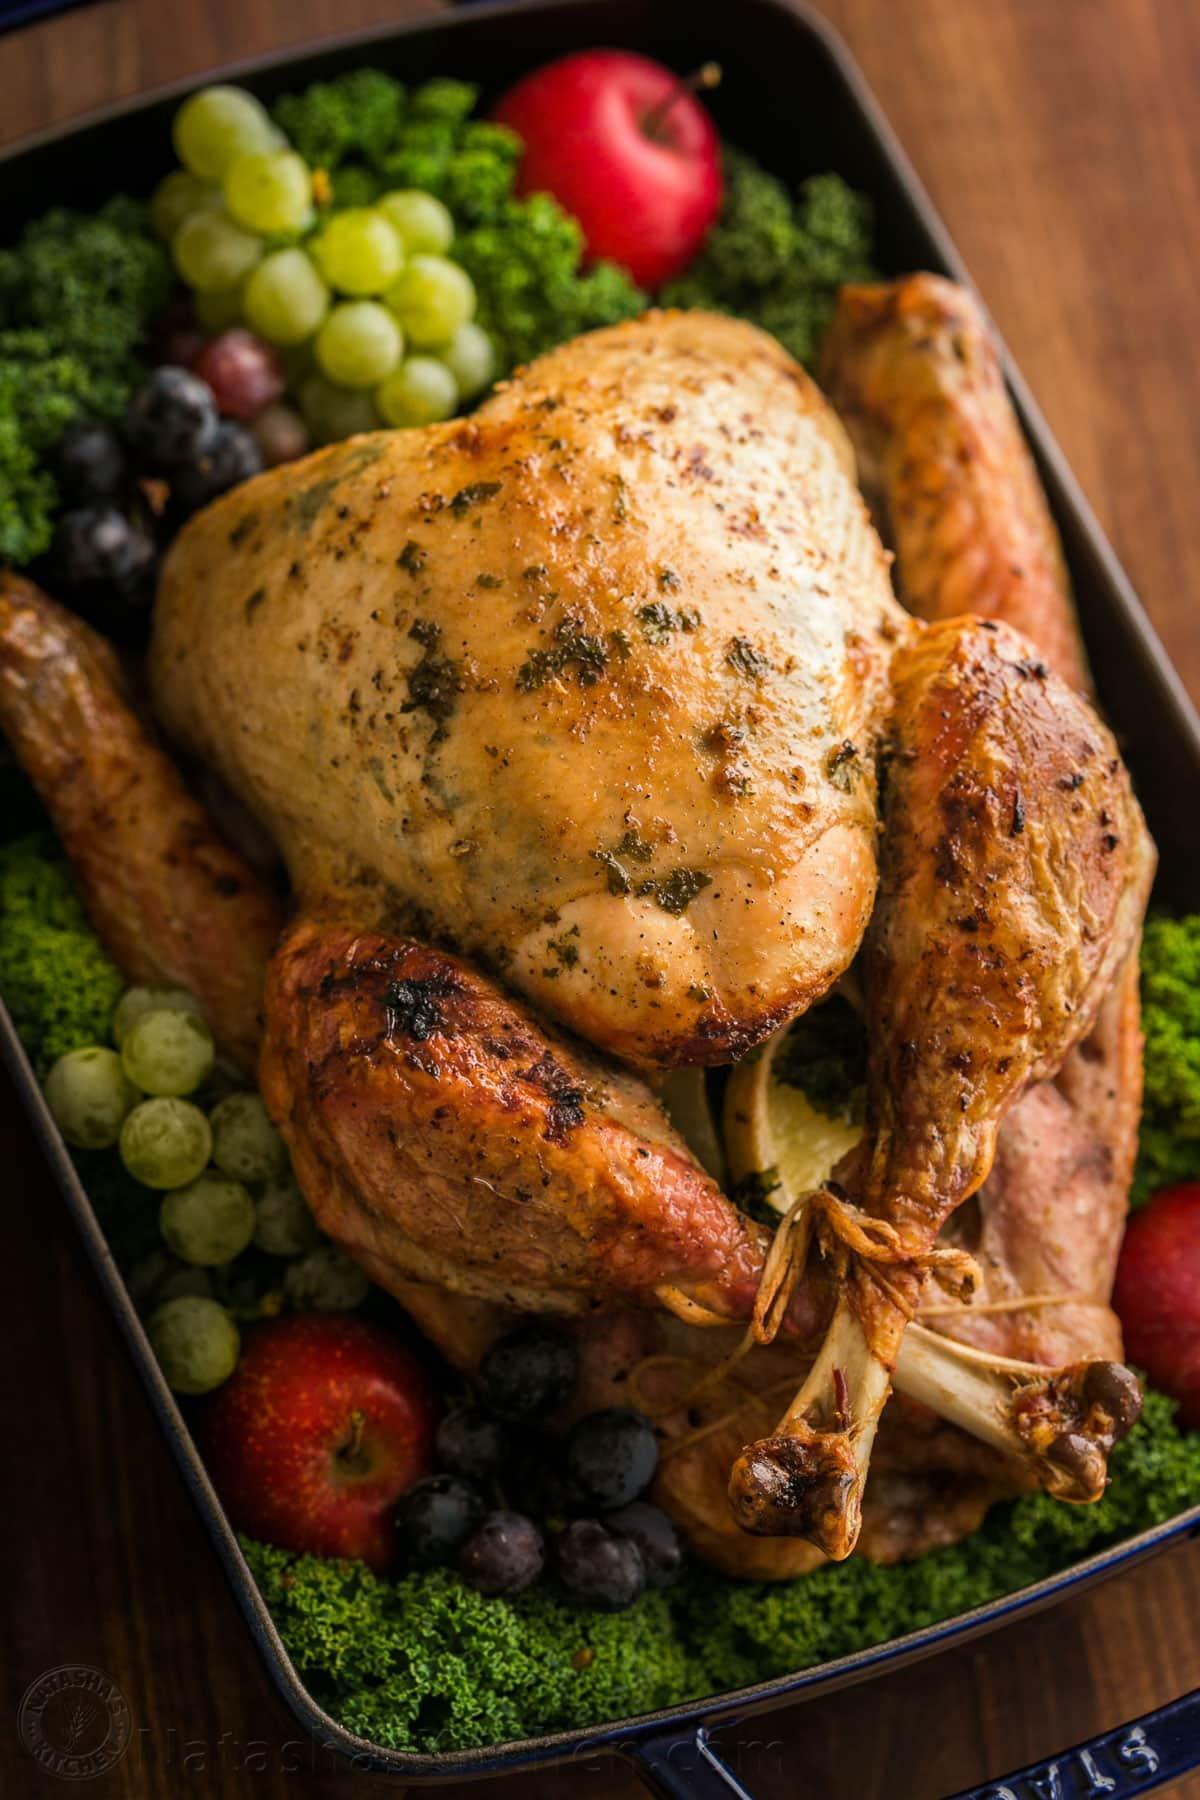 Bake Turkey Recipe For Thanksgiving  Thanksgiving Turkey Recipe VIDEO NatashasKitchen